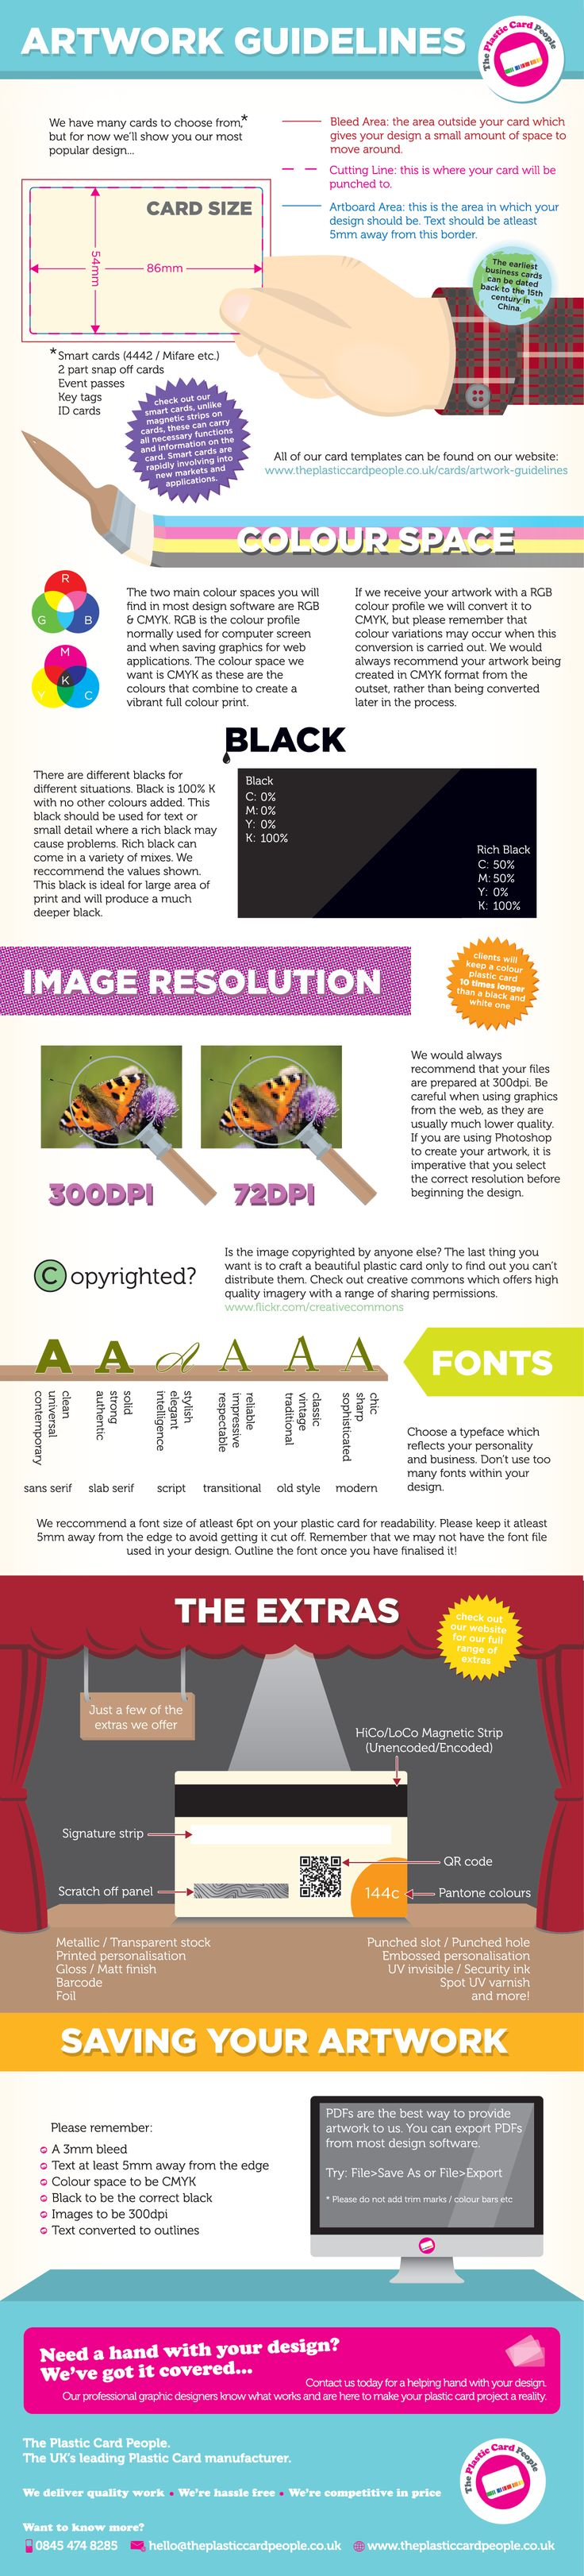 Best 25 Plastic card ideas on Pinterest